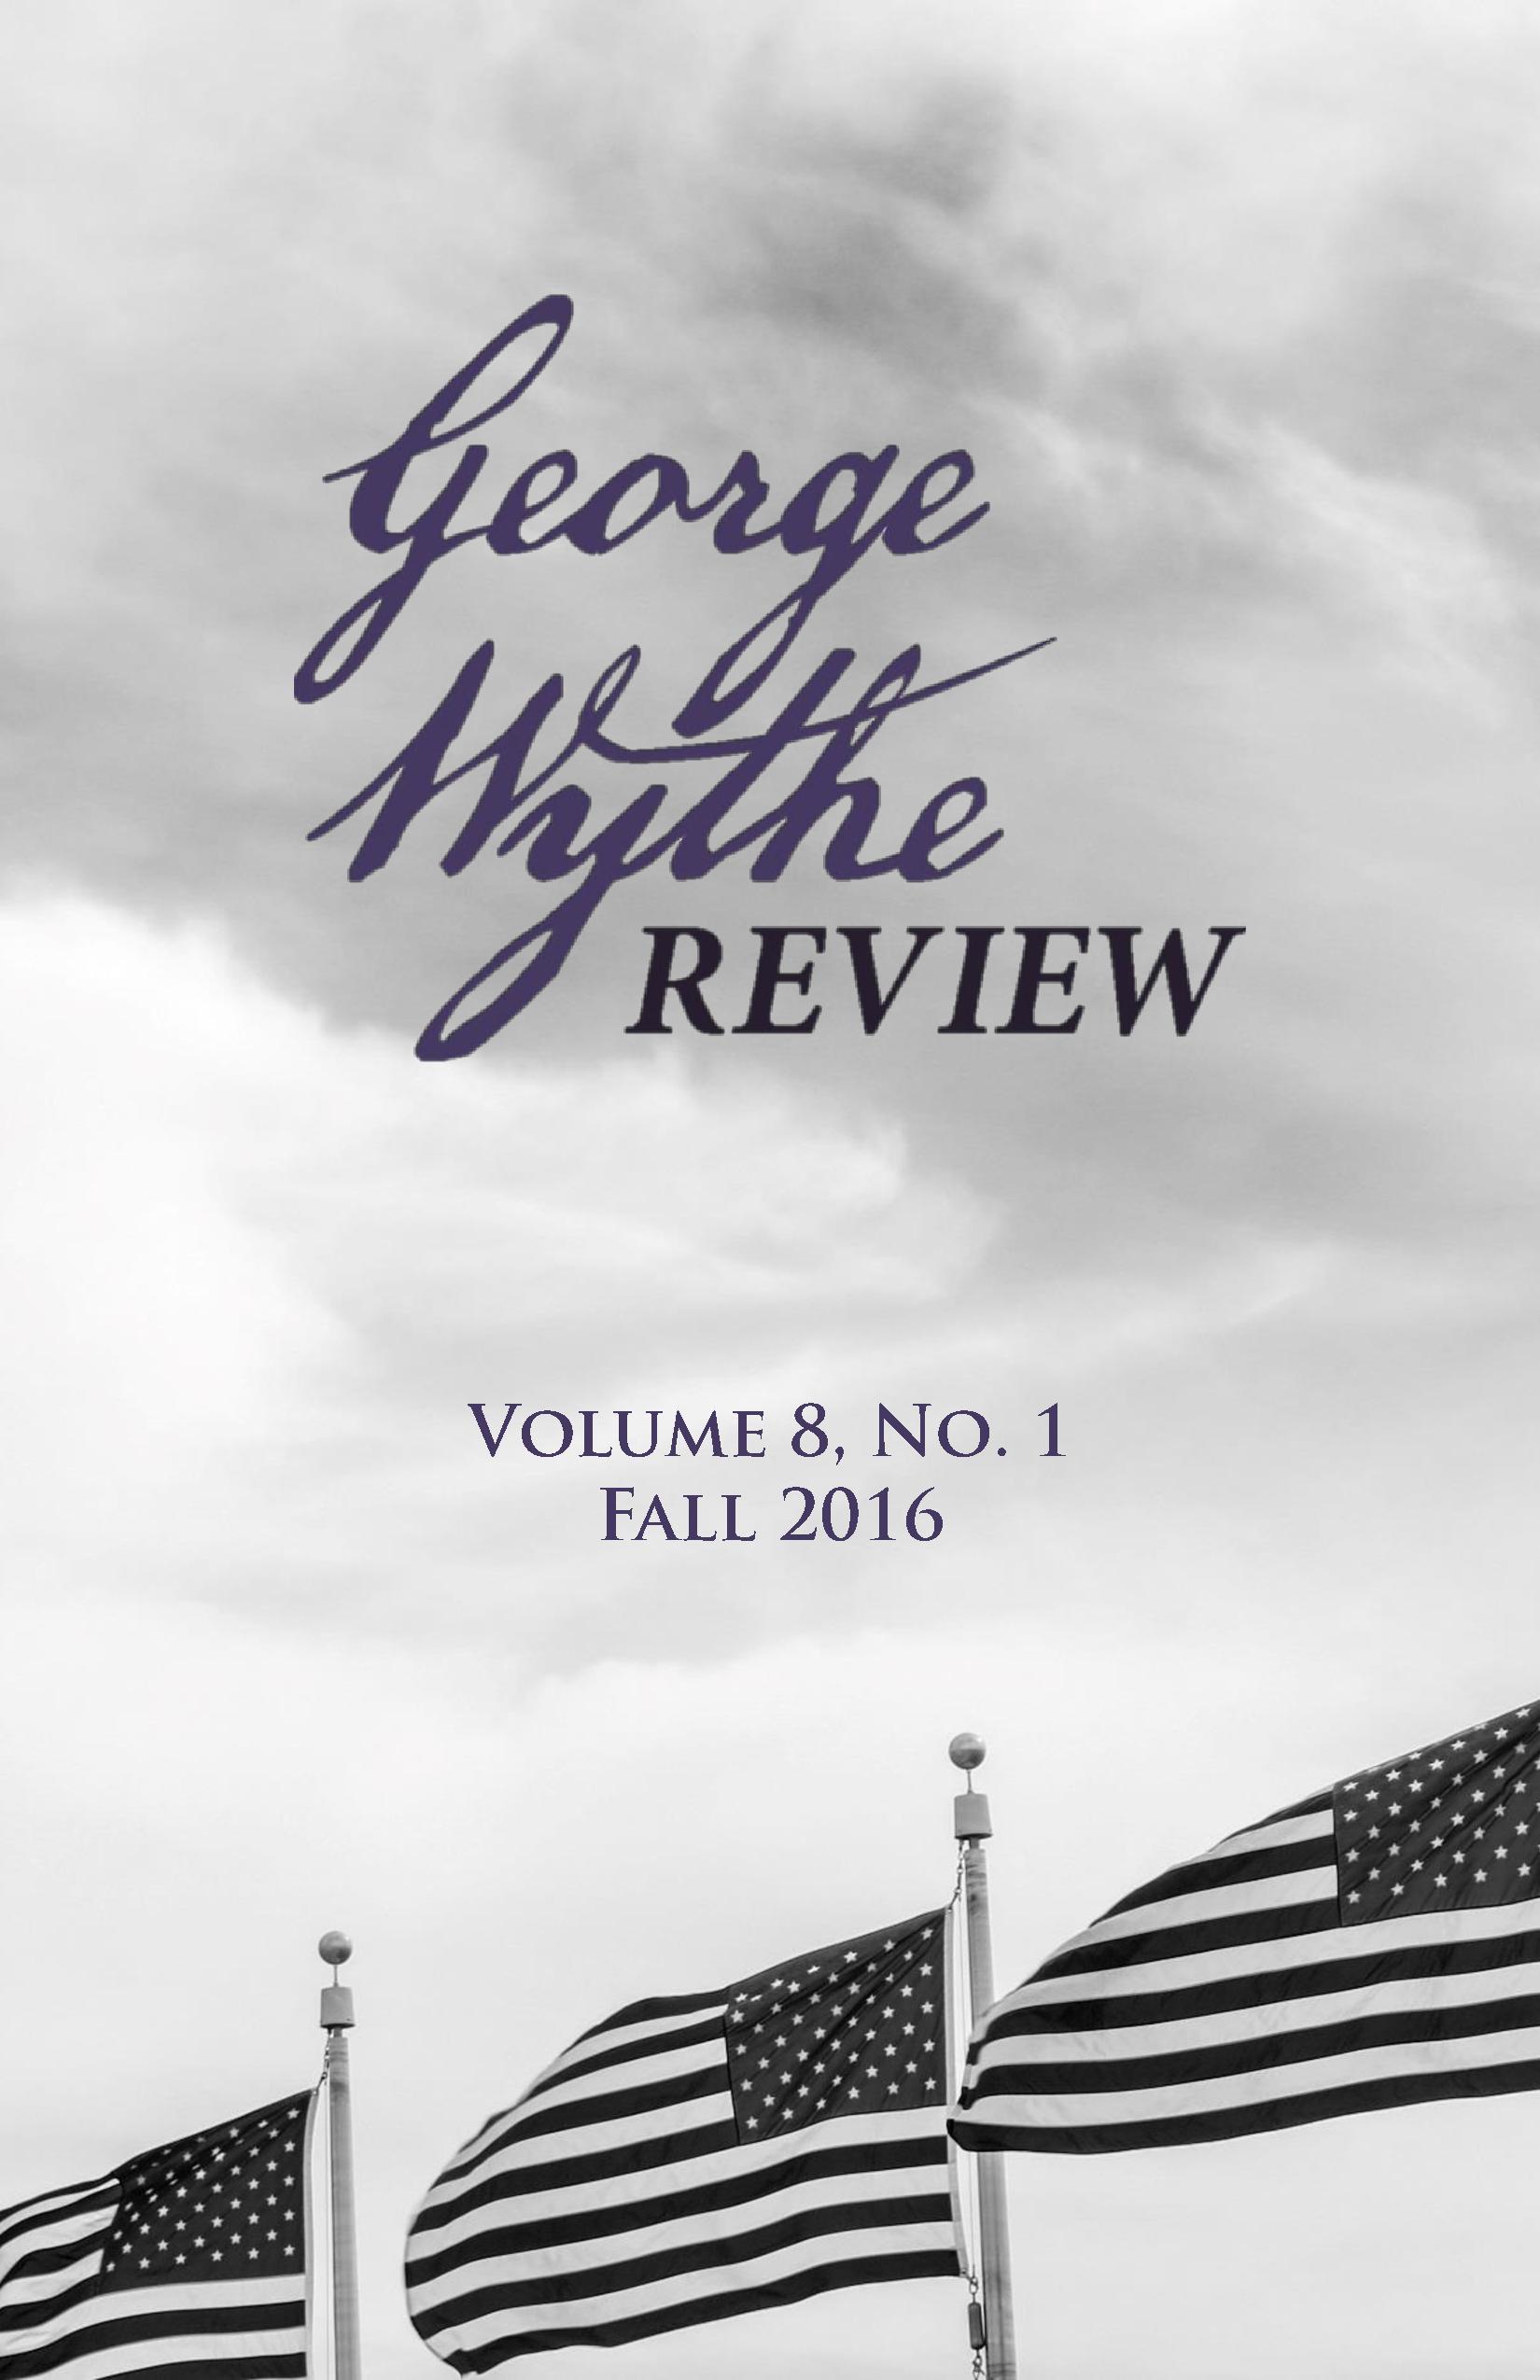 George_Wythe_Review-1.jpg